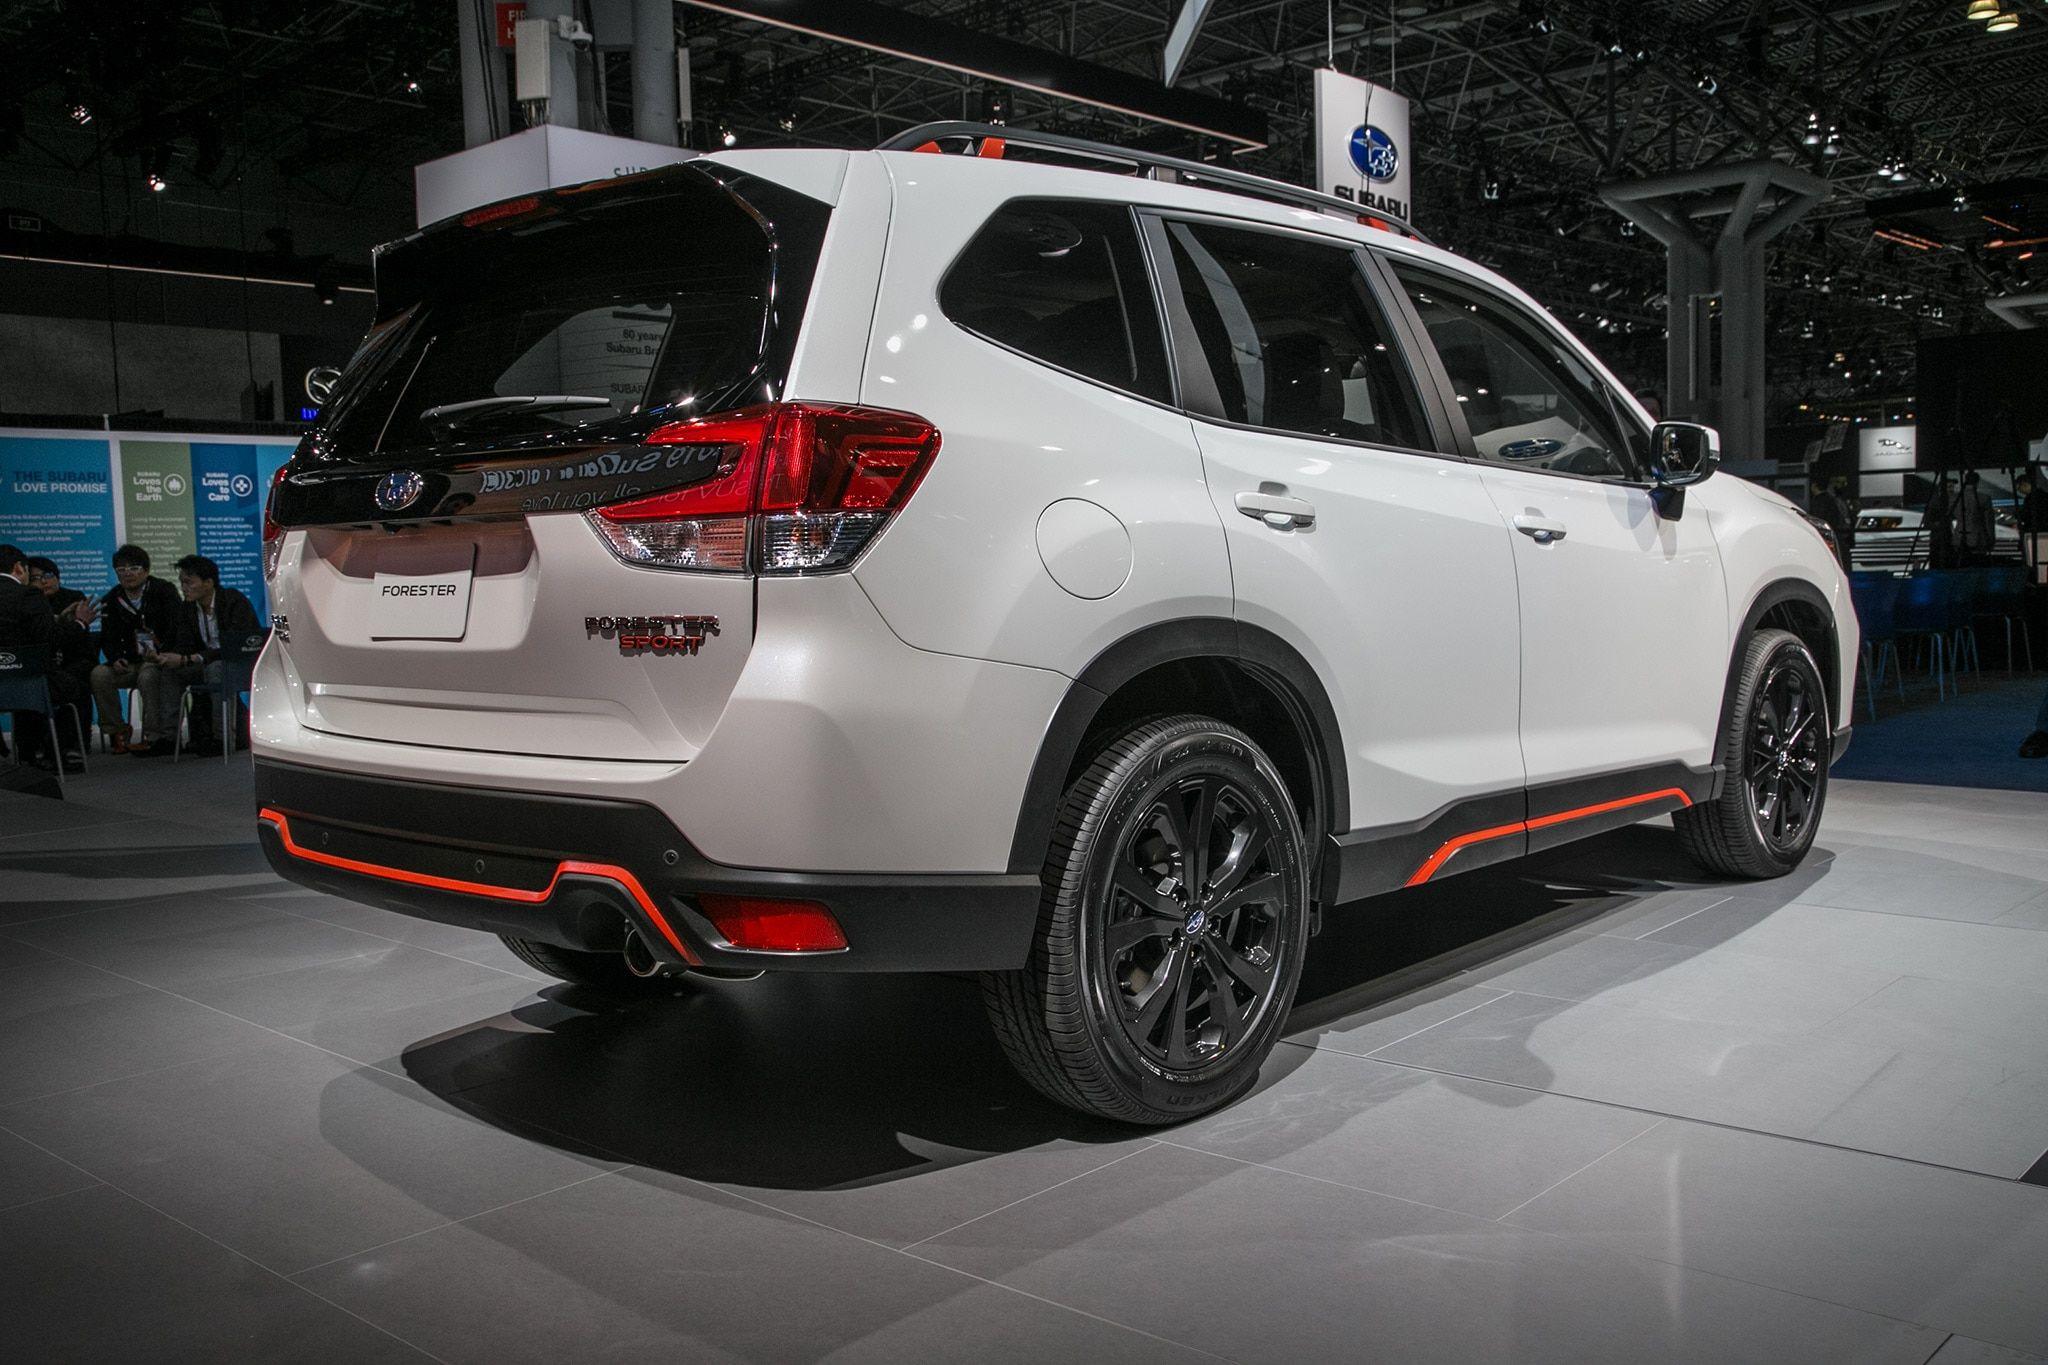 2019 Subaru Forester First Look Ready For The Crv And Rav4 Motor Trend Canada Subaru Forester Subaru Subaru Crosstrek